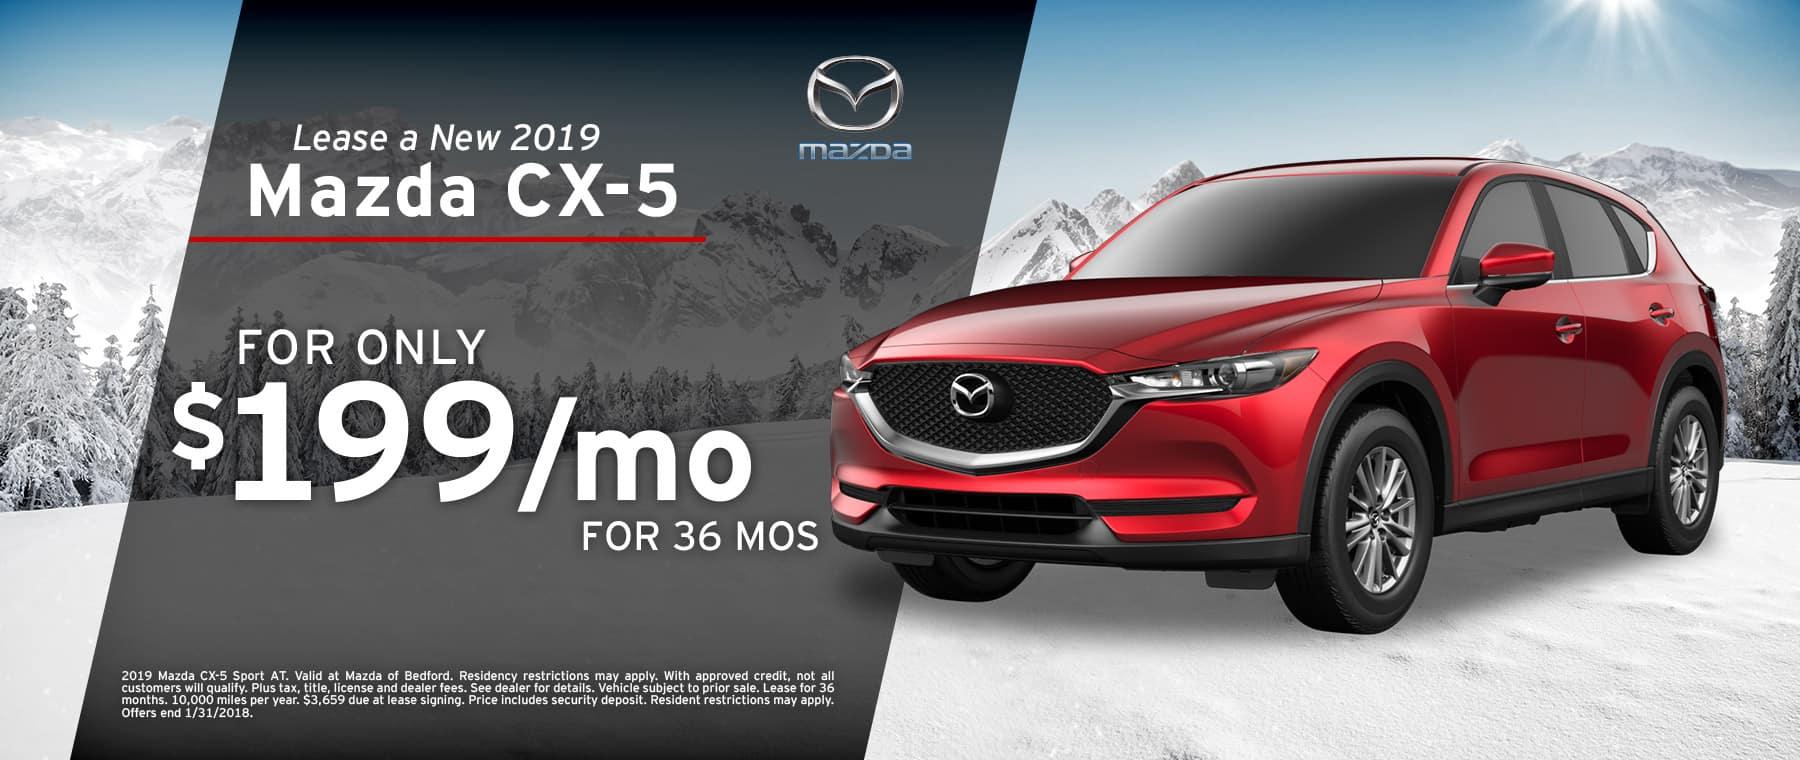 2019 Mazda CX-5 Lease Offer